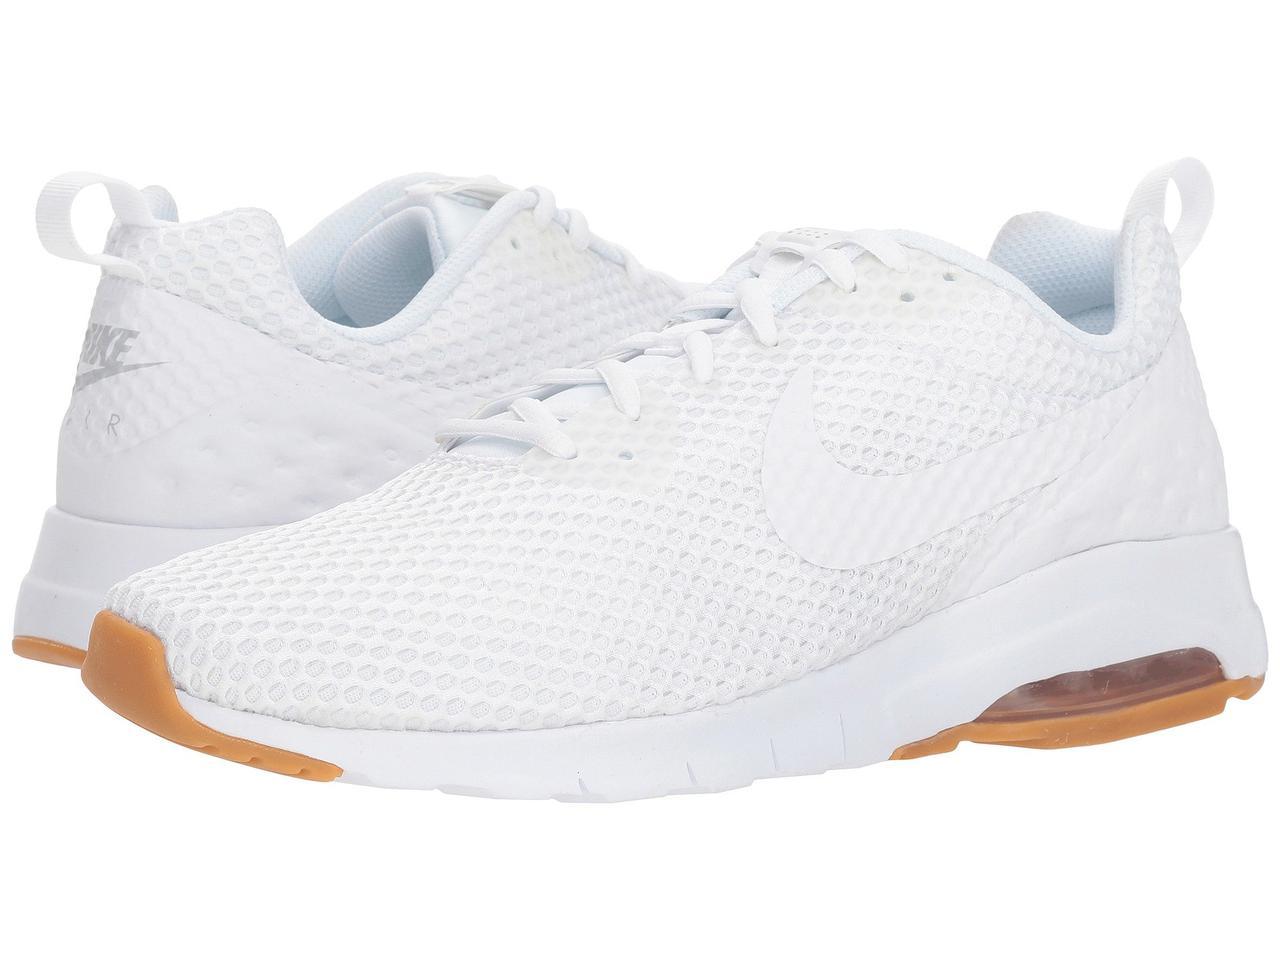 Кроссовки Nike Air Max Motion Low SE White White Wolf Grey Gum Light ... bbd7245299fab